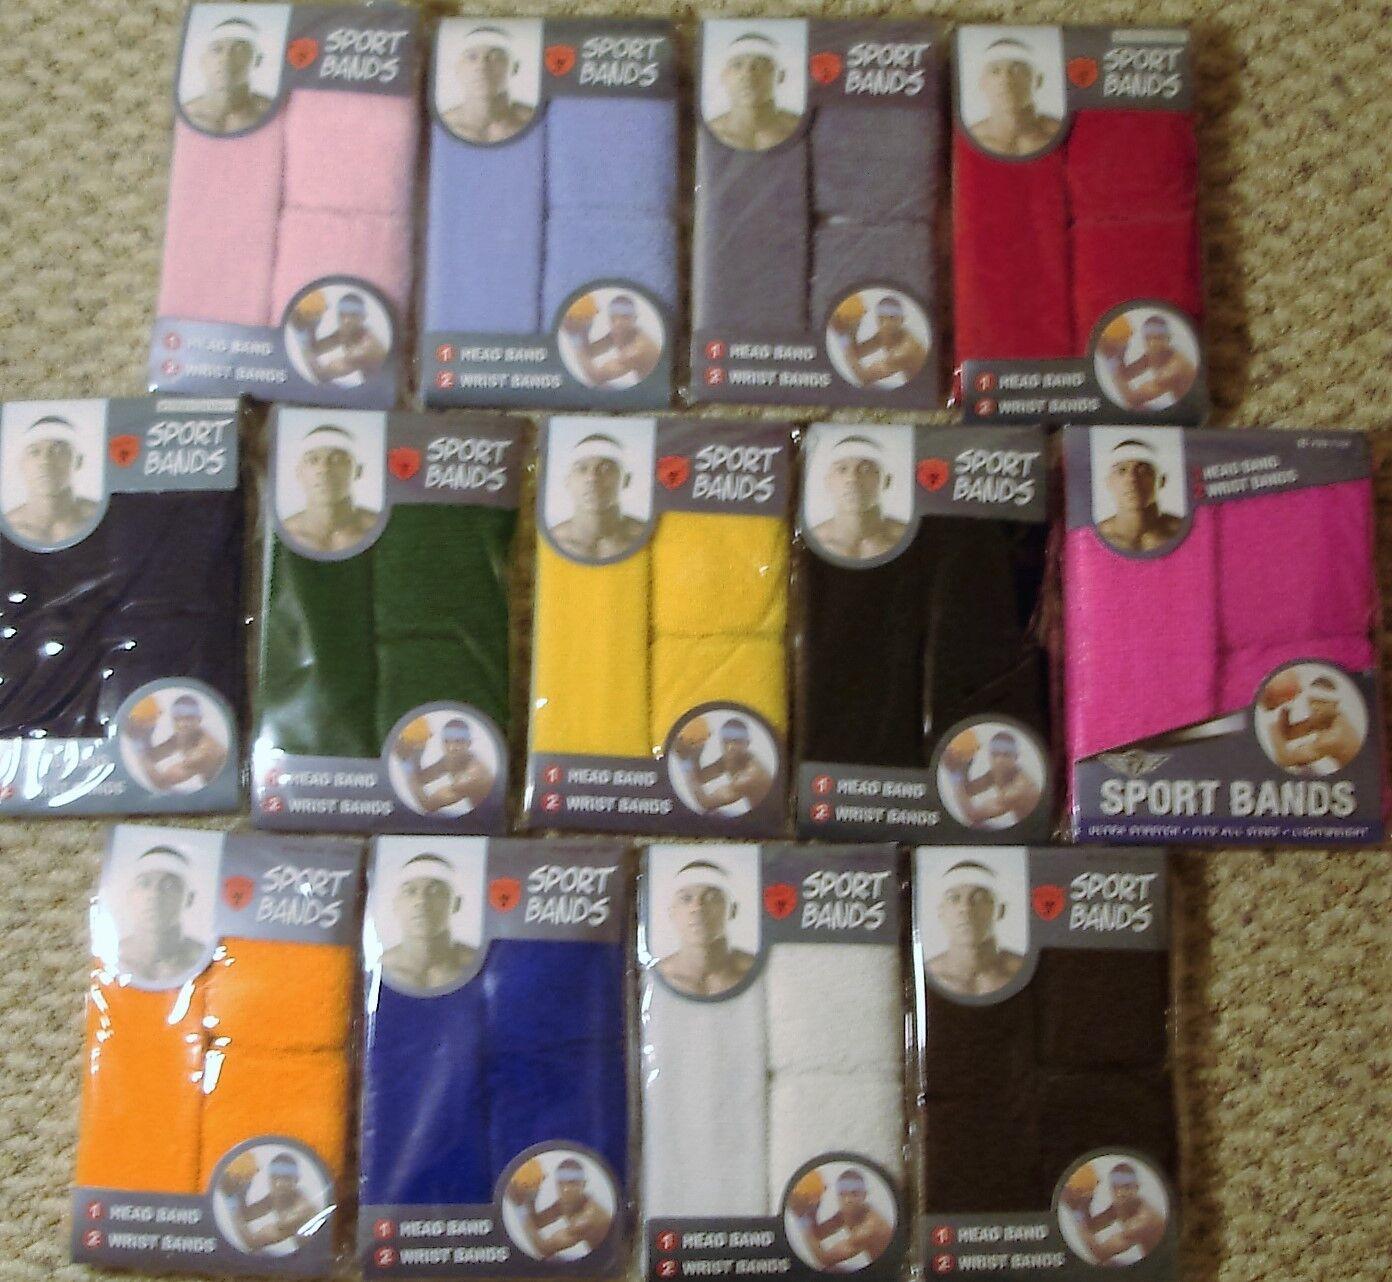 Sweatbands/Wristbands & Headband Set, Terry Cloth Soft Wrist